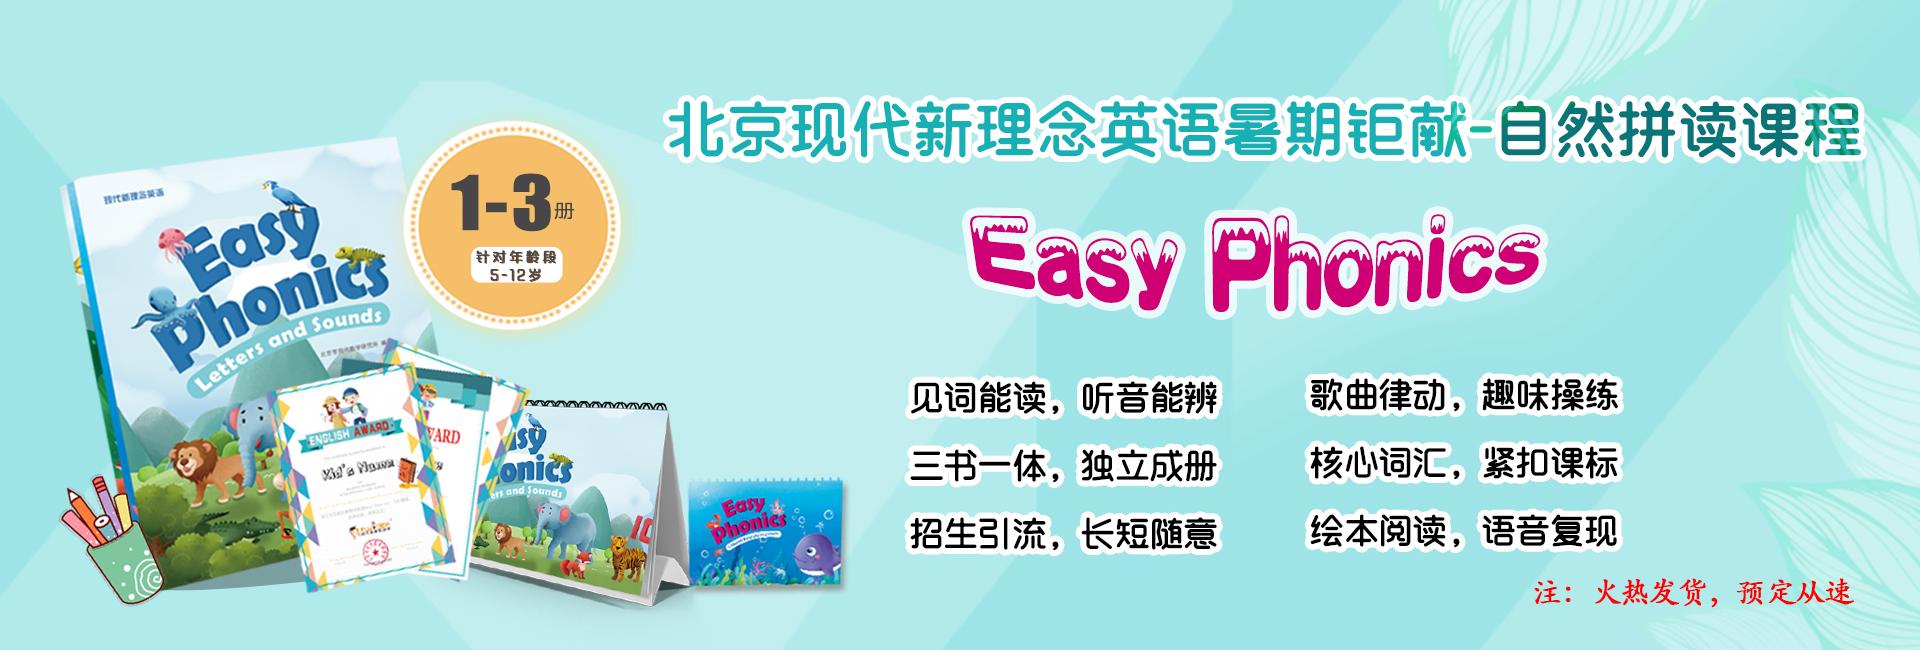 Easy phonics——暑期自然拼读课程